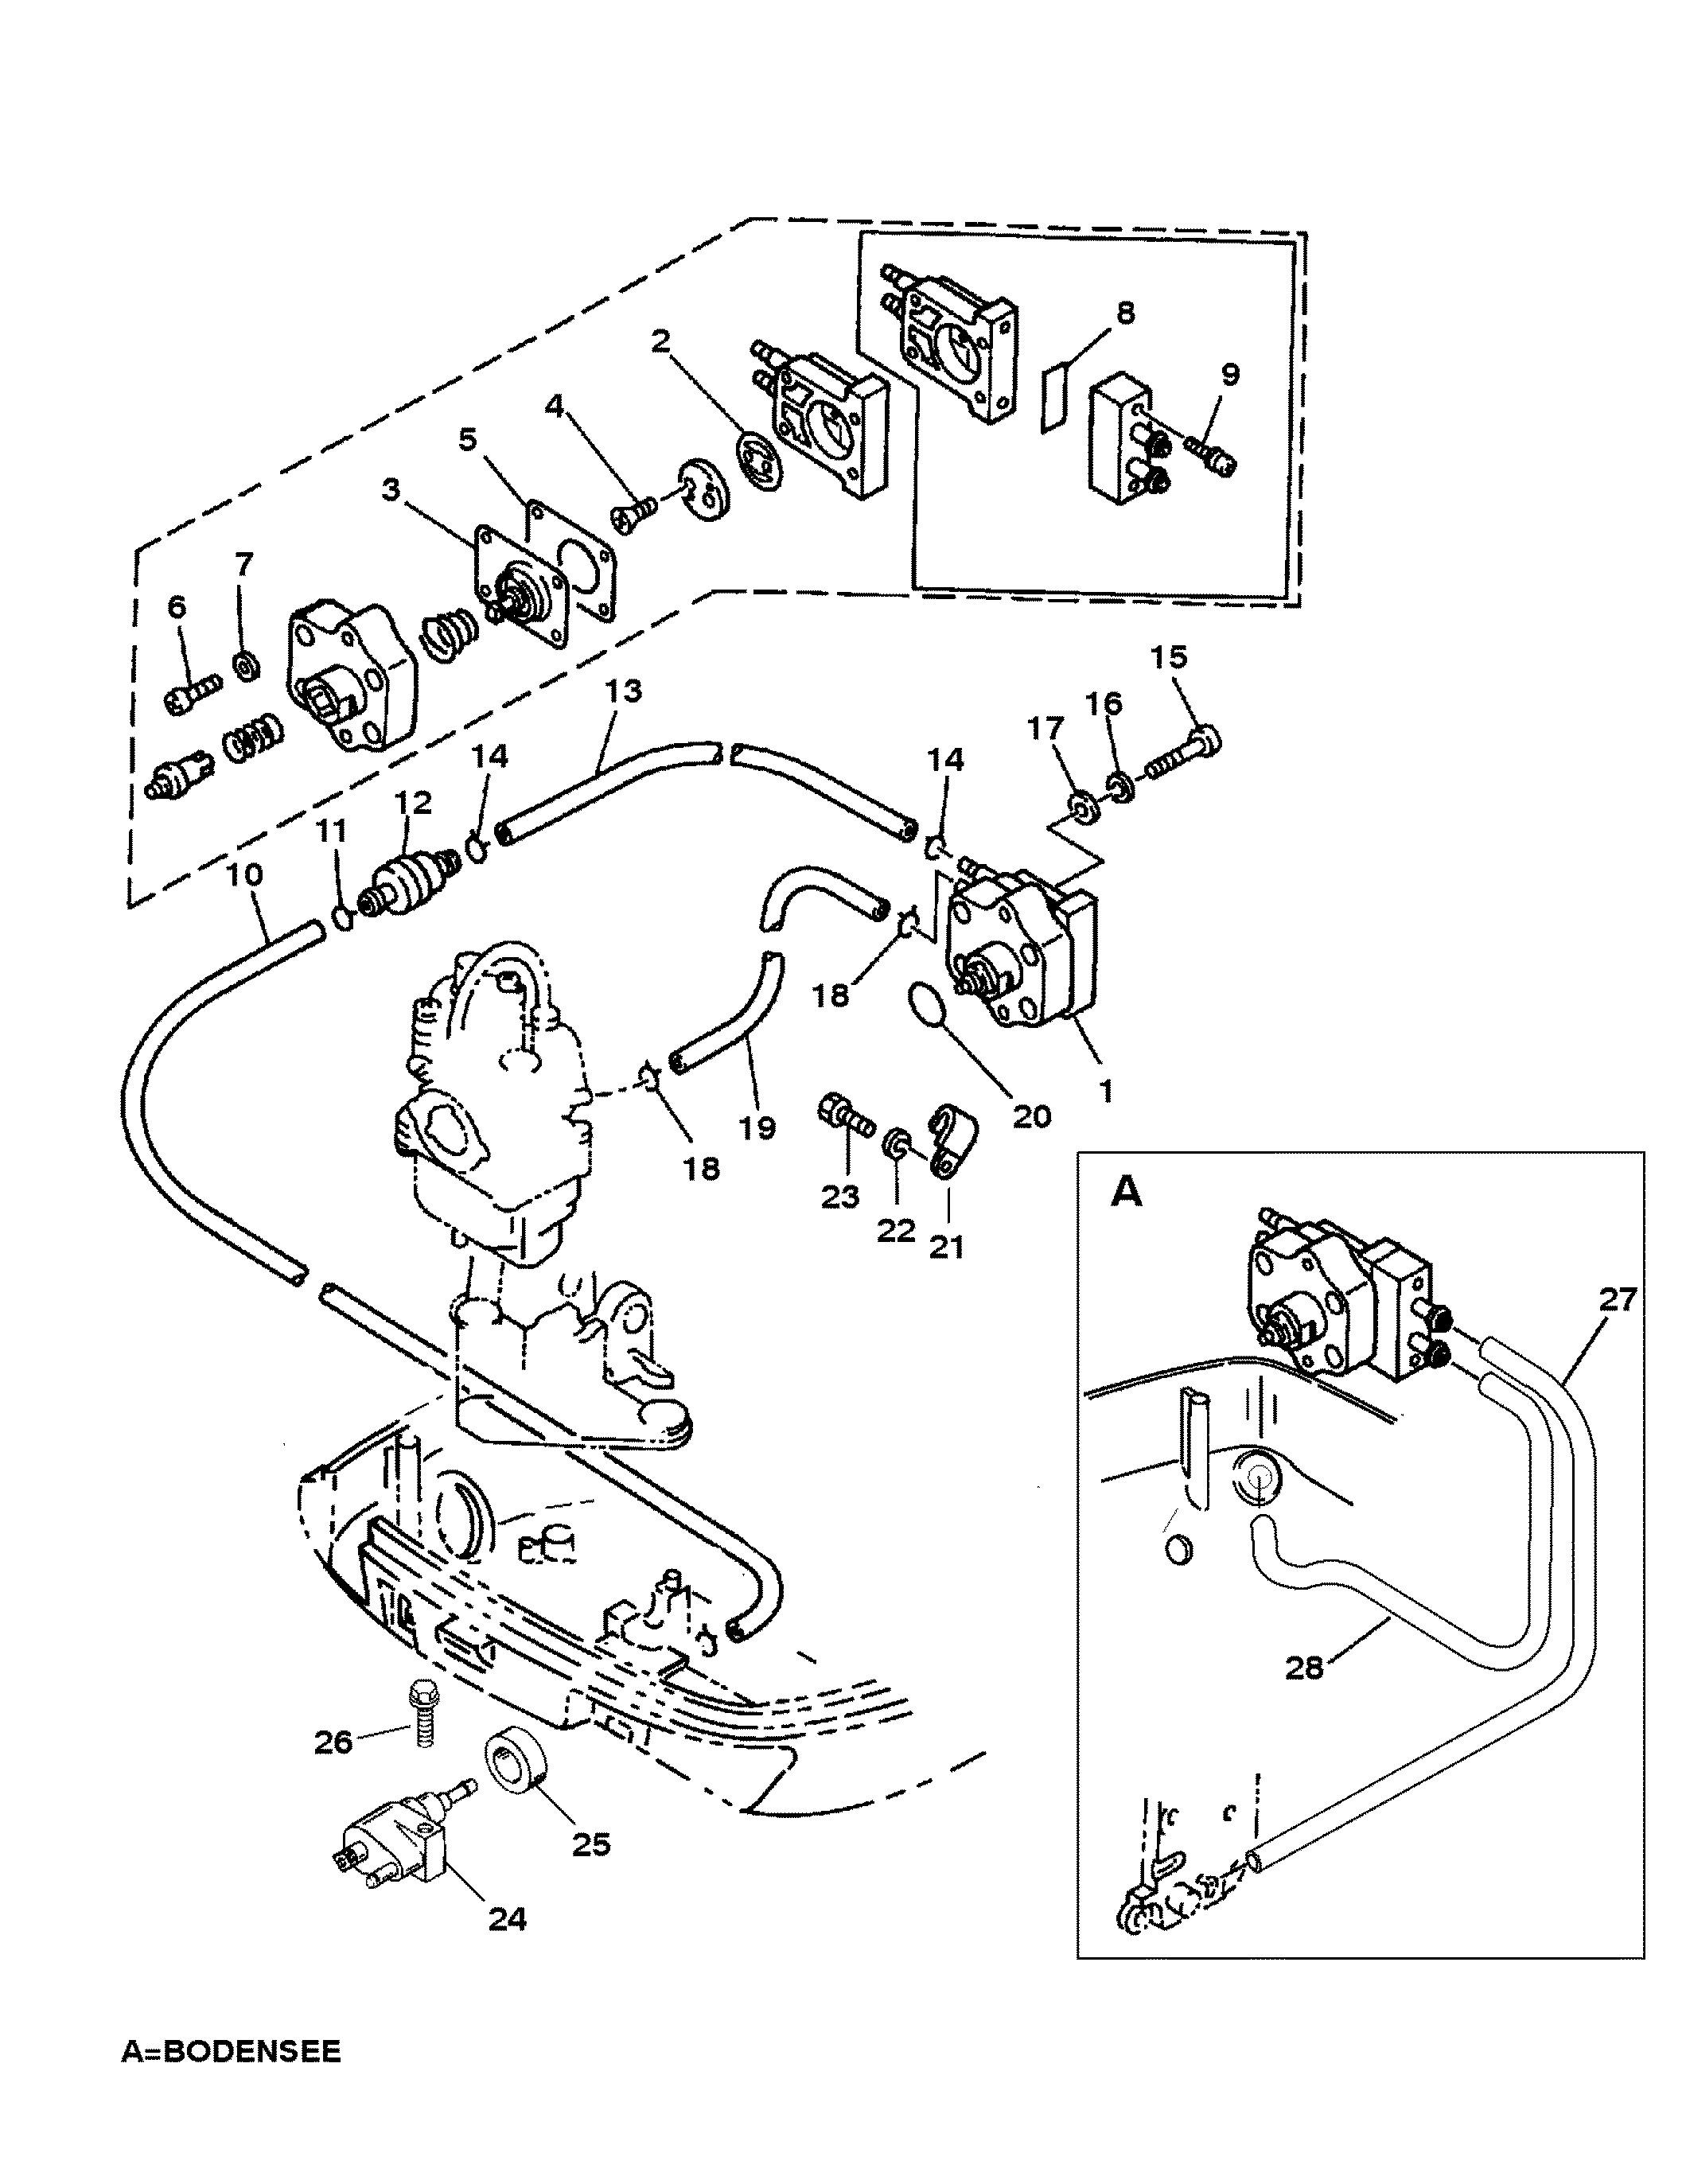 Diagram Of Four Stroke Petrol Engine Fuel Pump for Mariner Mercury 9 9 8 Bondensee 4 Stroke Of Diagram Of Four Stroke Petrol Engine